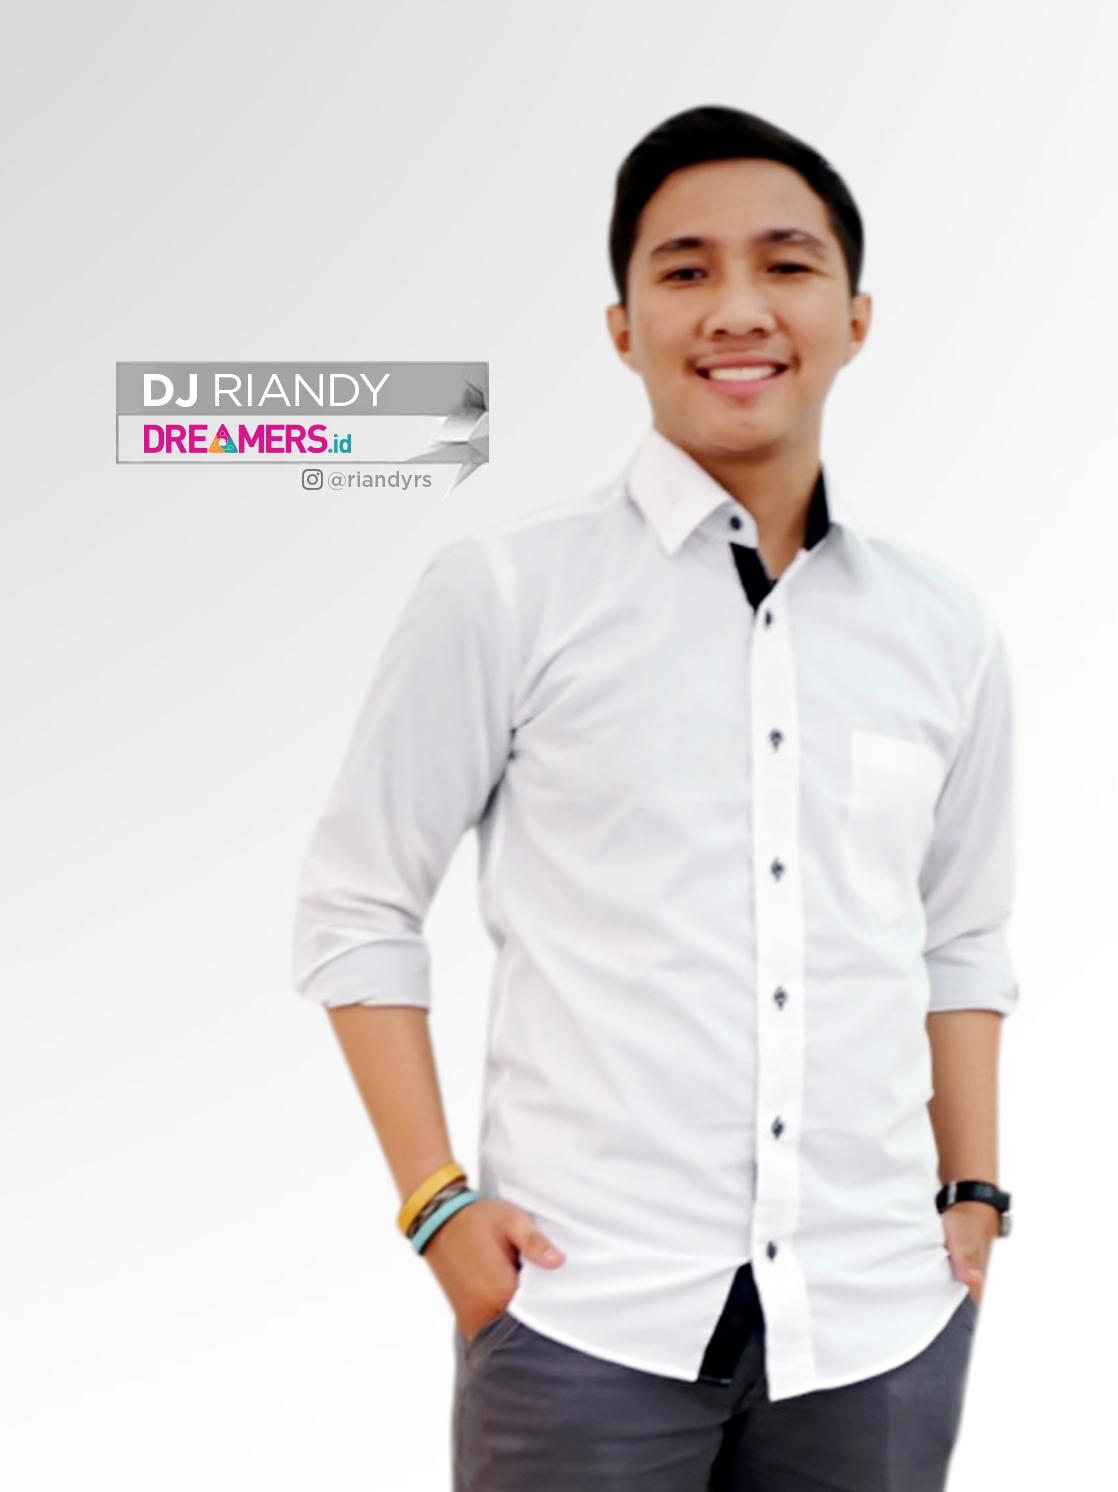 DJ Riandy